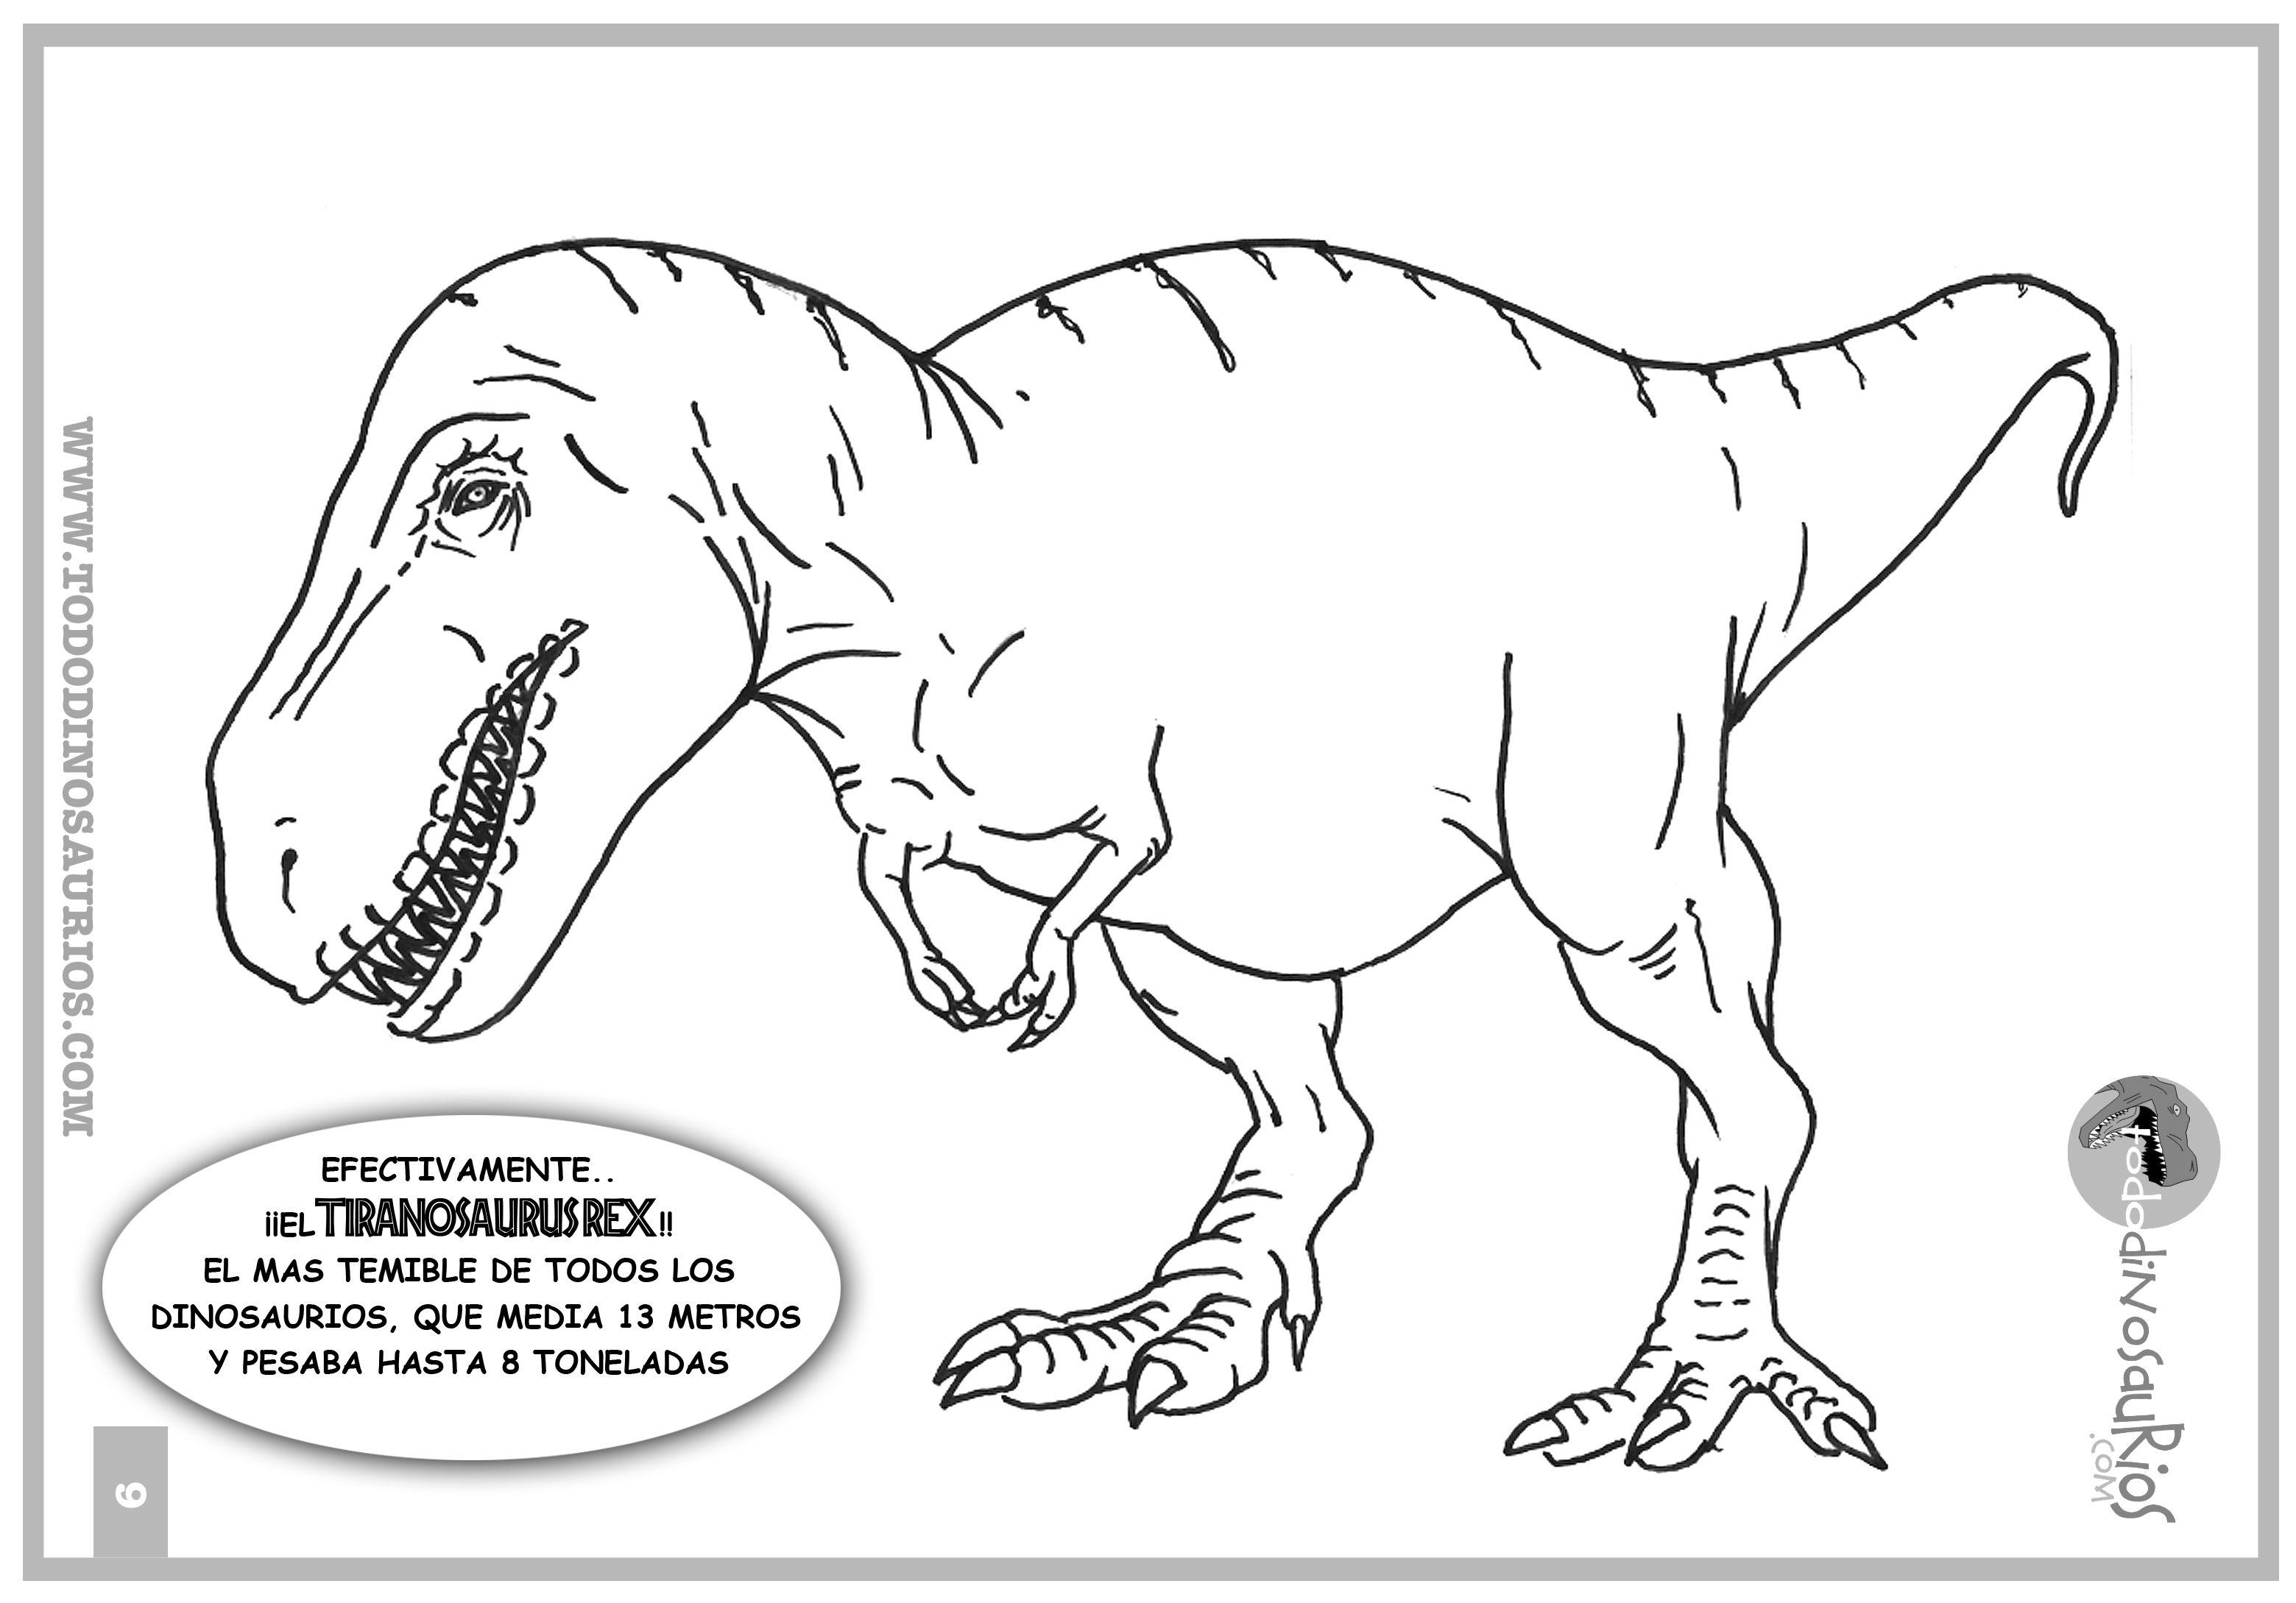 Dibujos De Dinosaurios Para Colorear El Tiranosaurio Rex Tiranosaurios Rex Dibujo De Dinosaurio Tiranosaurio